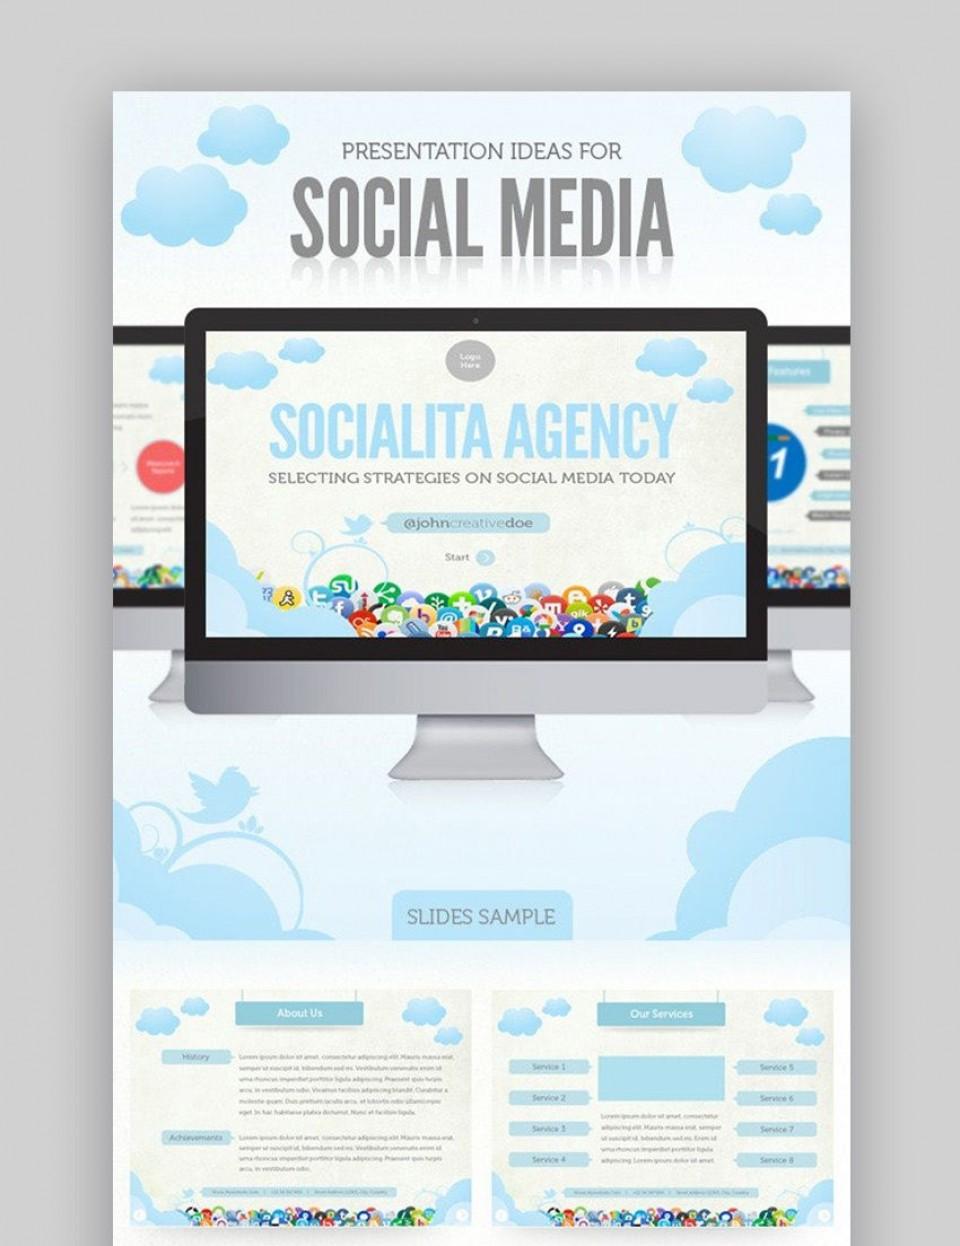 007 Marvelou Social Media Proposal Template Ppt High Definition 960